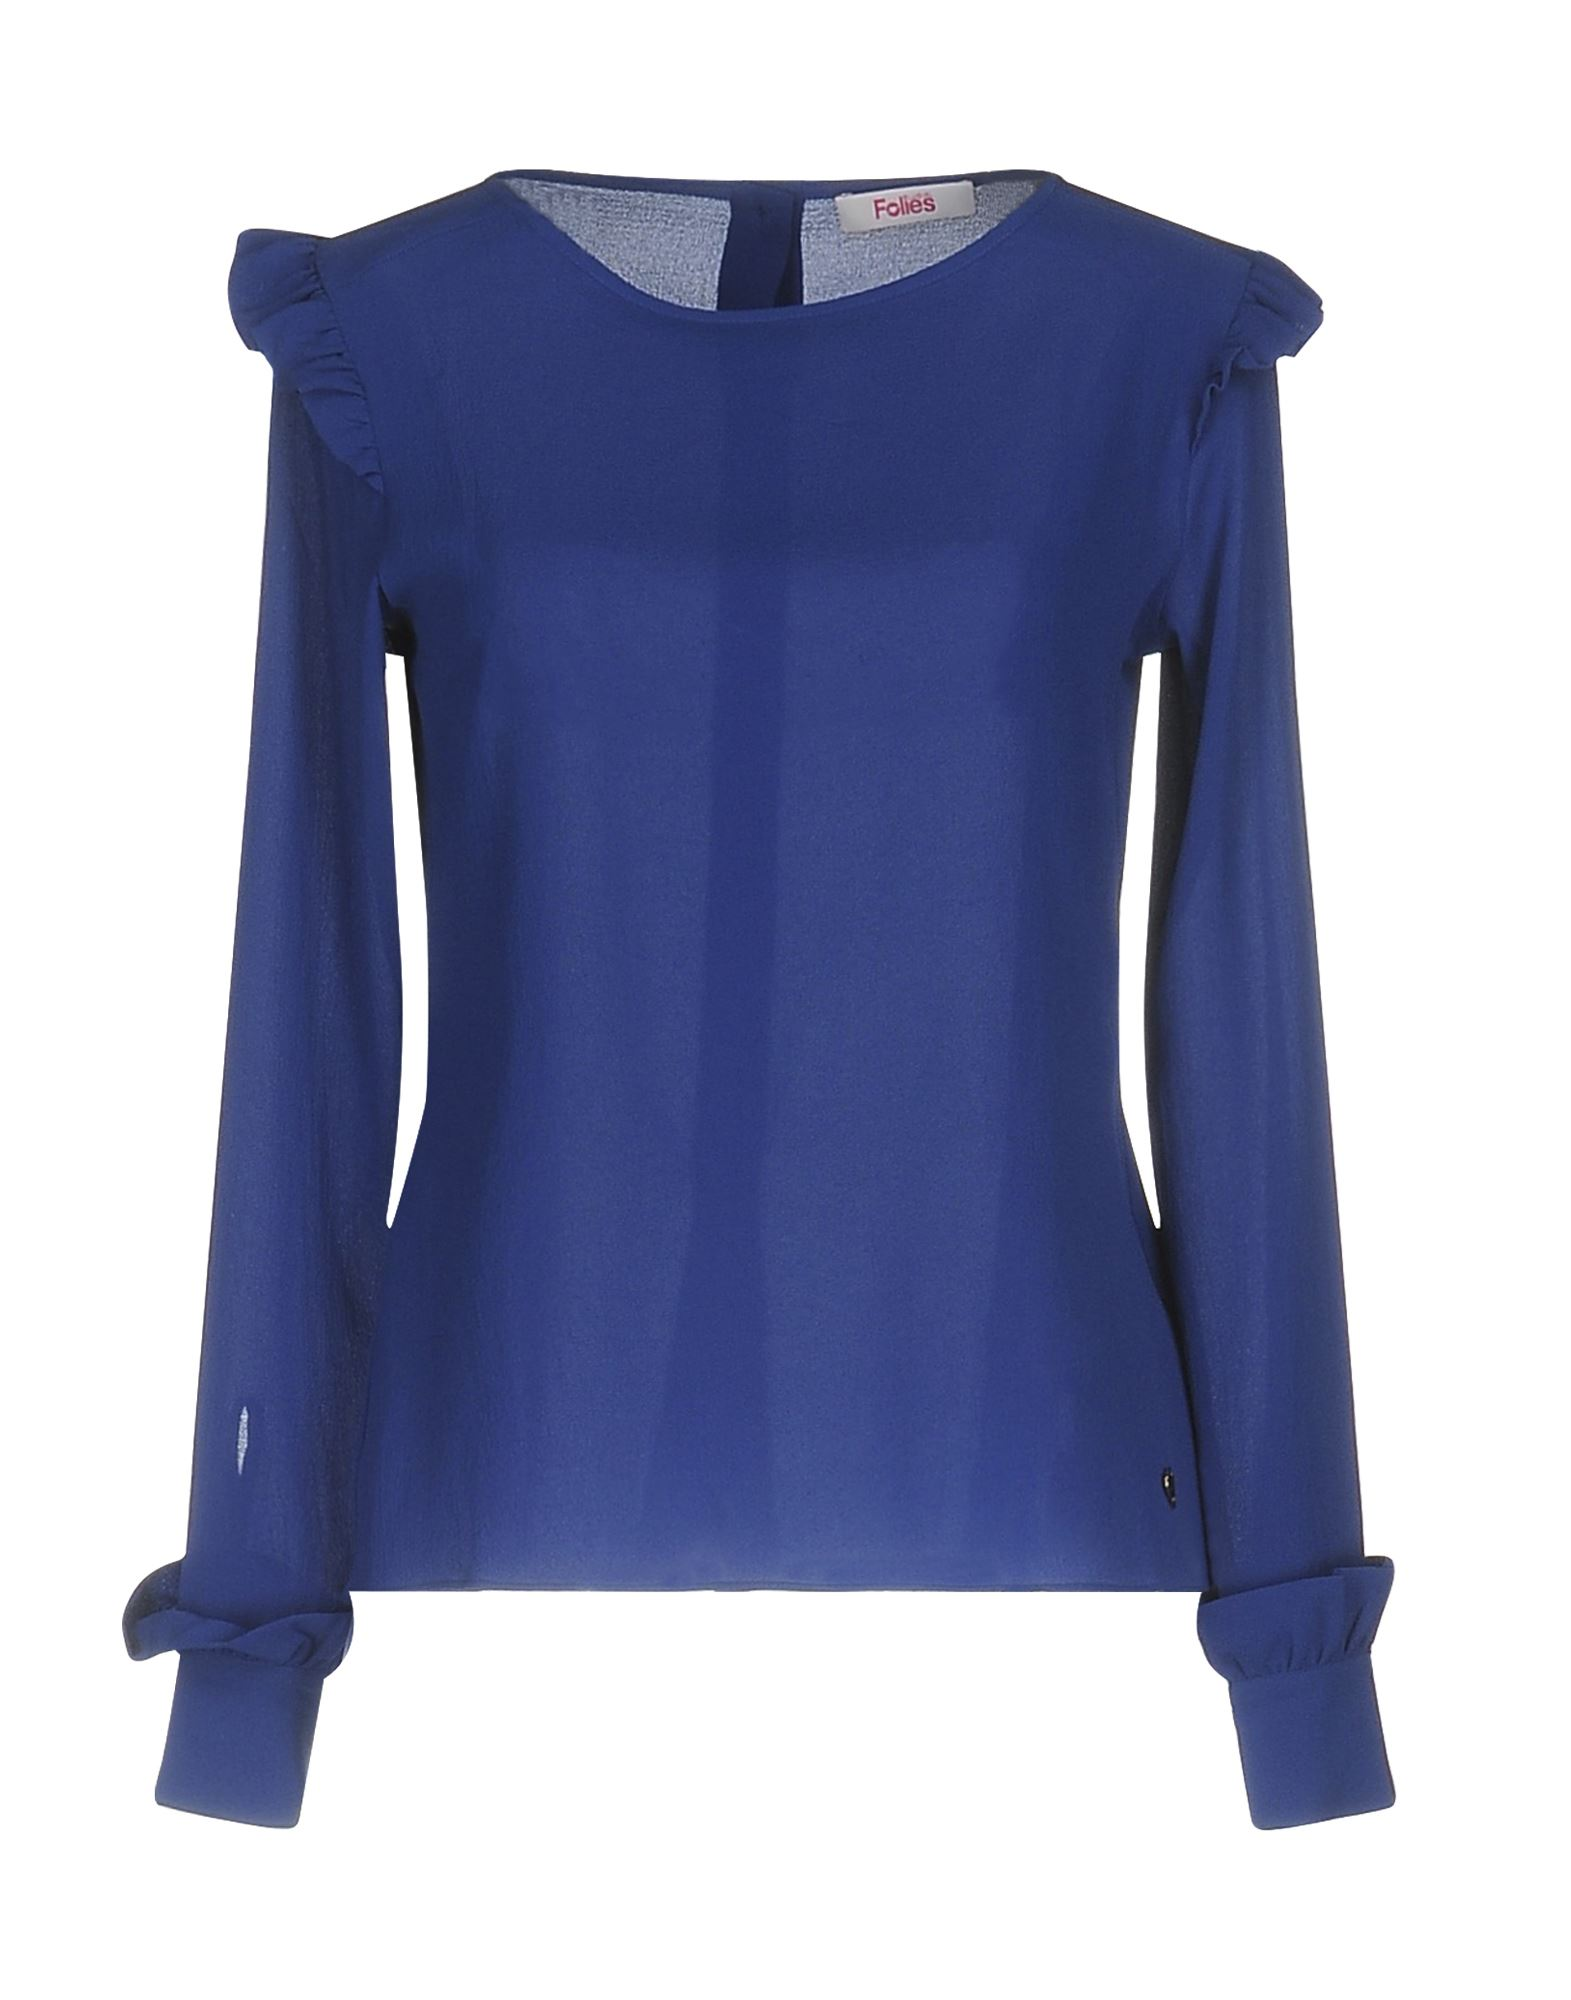 blugirl blumarine pубашка BLUGIRL BLUMARINE Pубашка